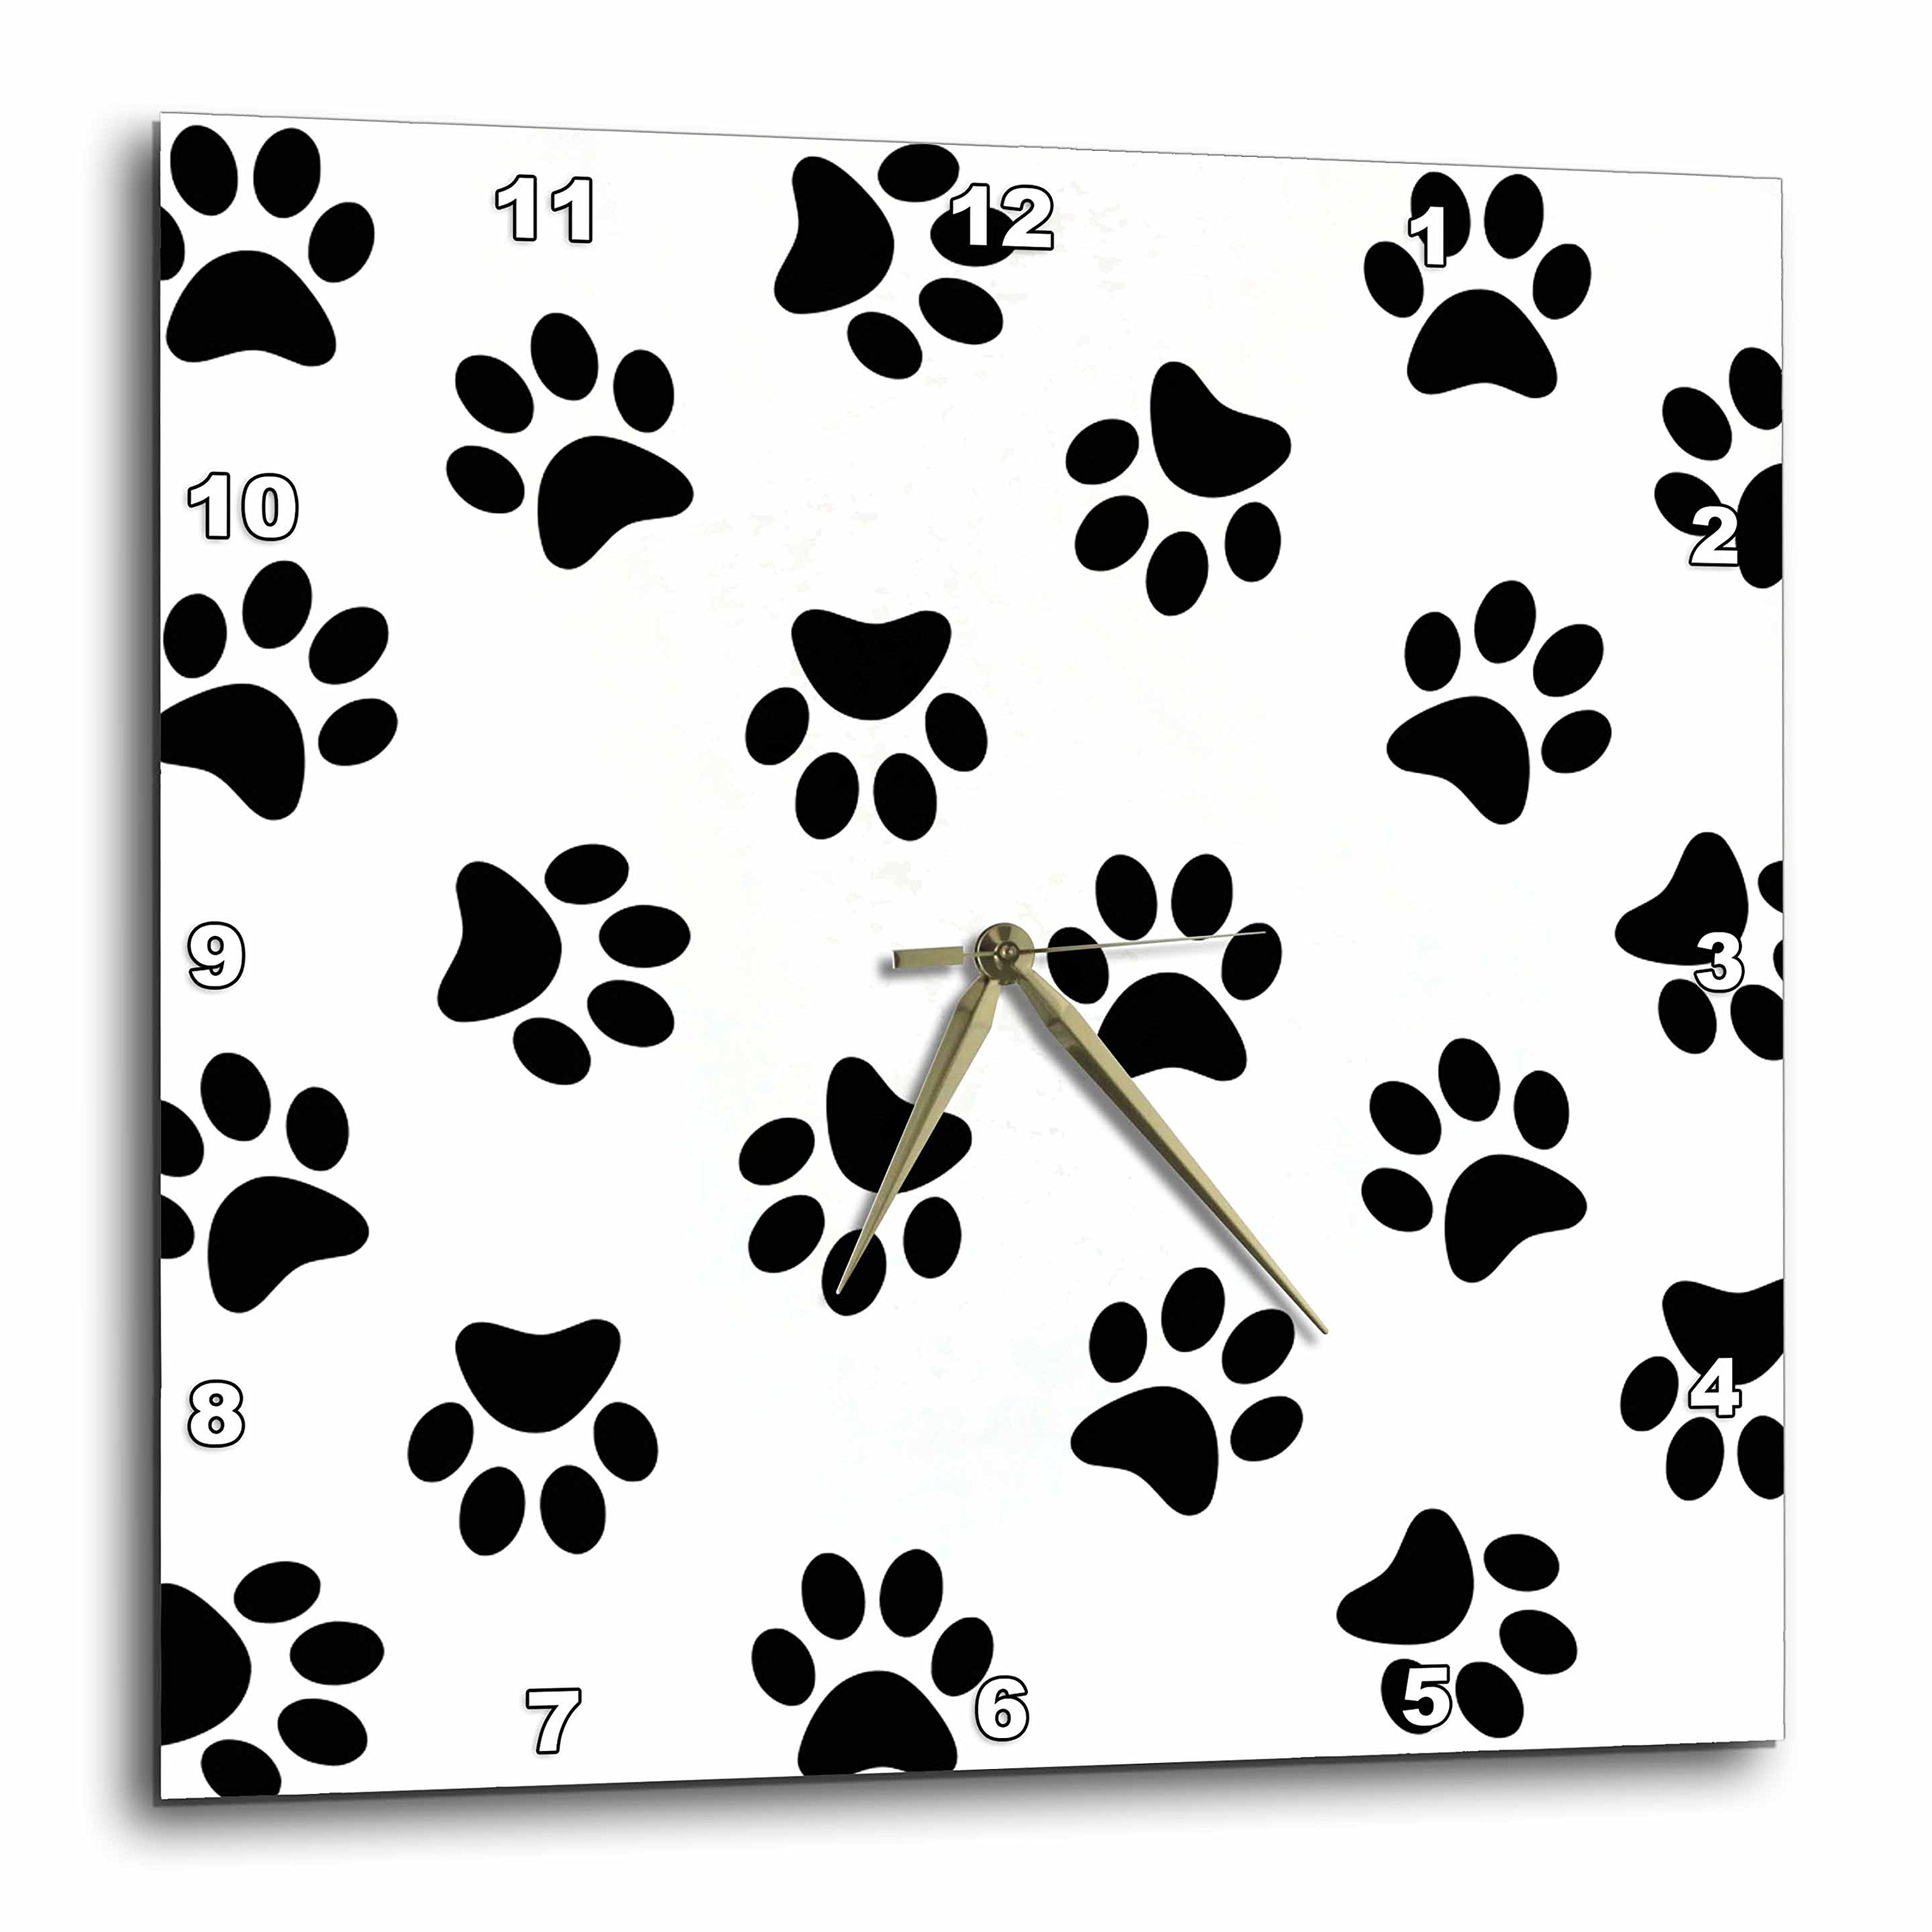 3dRose Paw Print Pattern - Black Pawprints on White - Cute Cartoon Animal Eg Dog or Cat Footprints - Wall Clock, 10 by 10-Inch (dpp_161521_1)